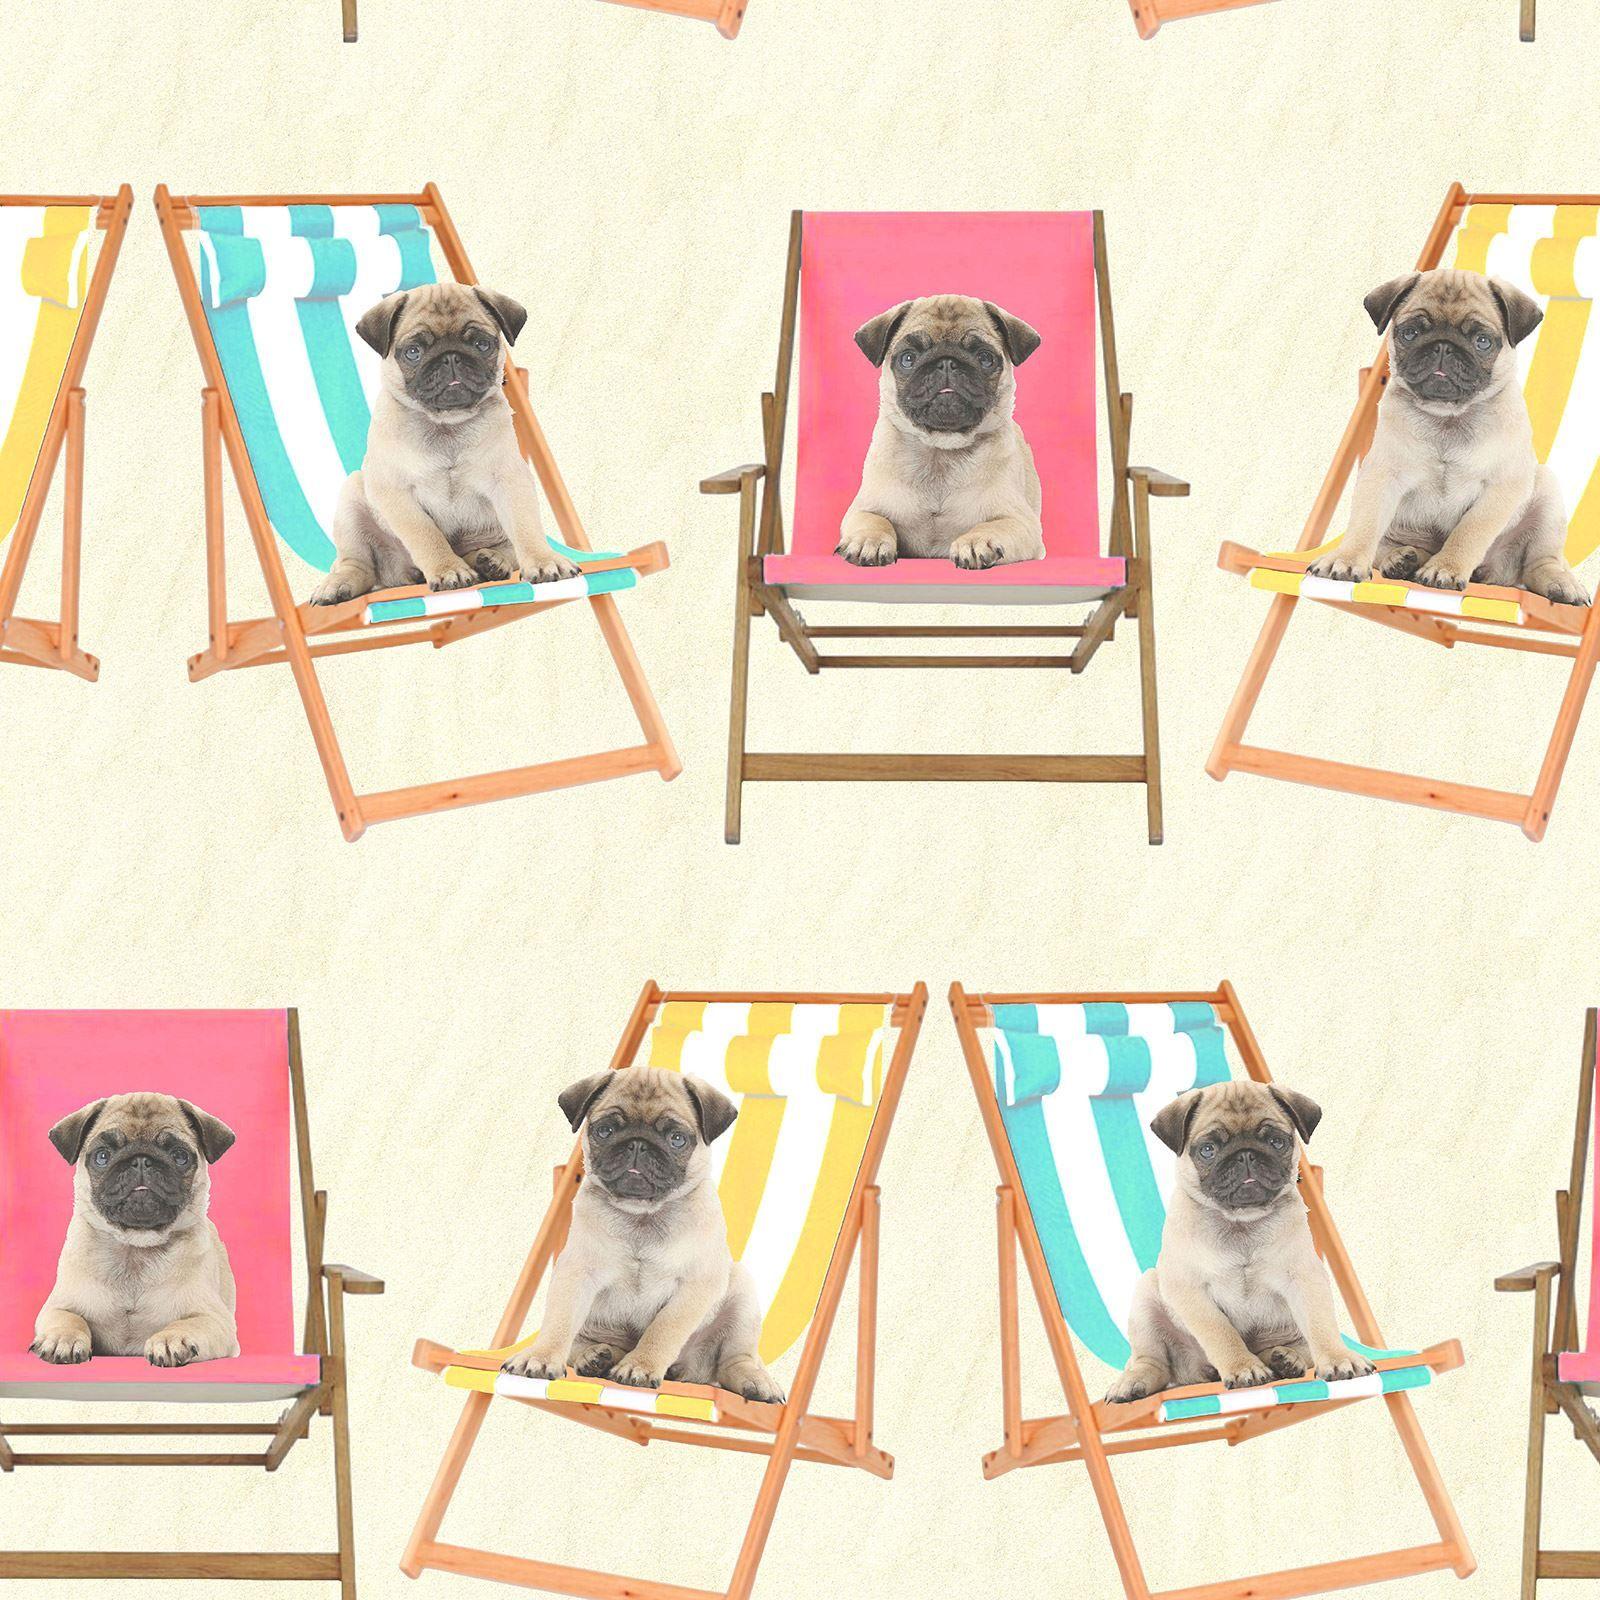 Dog Themed Wallpaper Animal Pug Puppy Frames Selfies Various Designs Available Dog Themed Dog Wallpaper Pug Dog